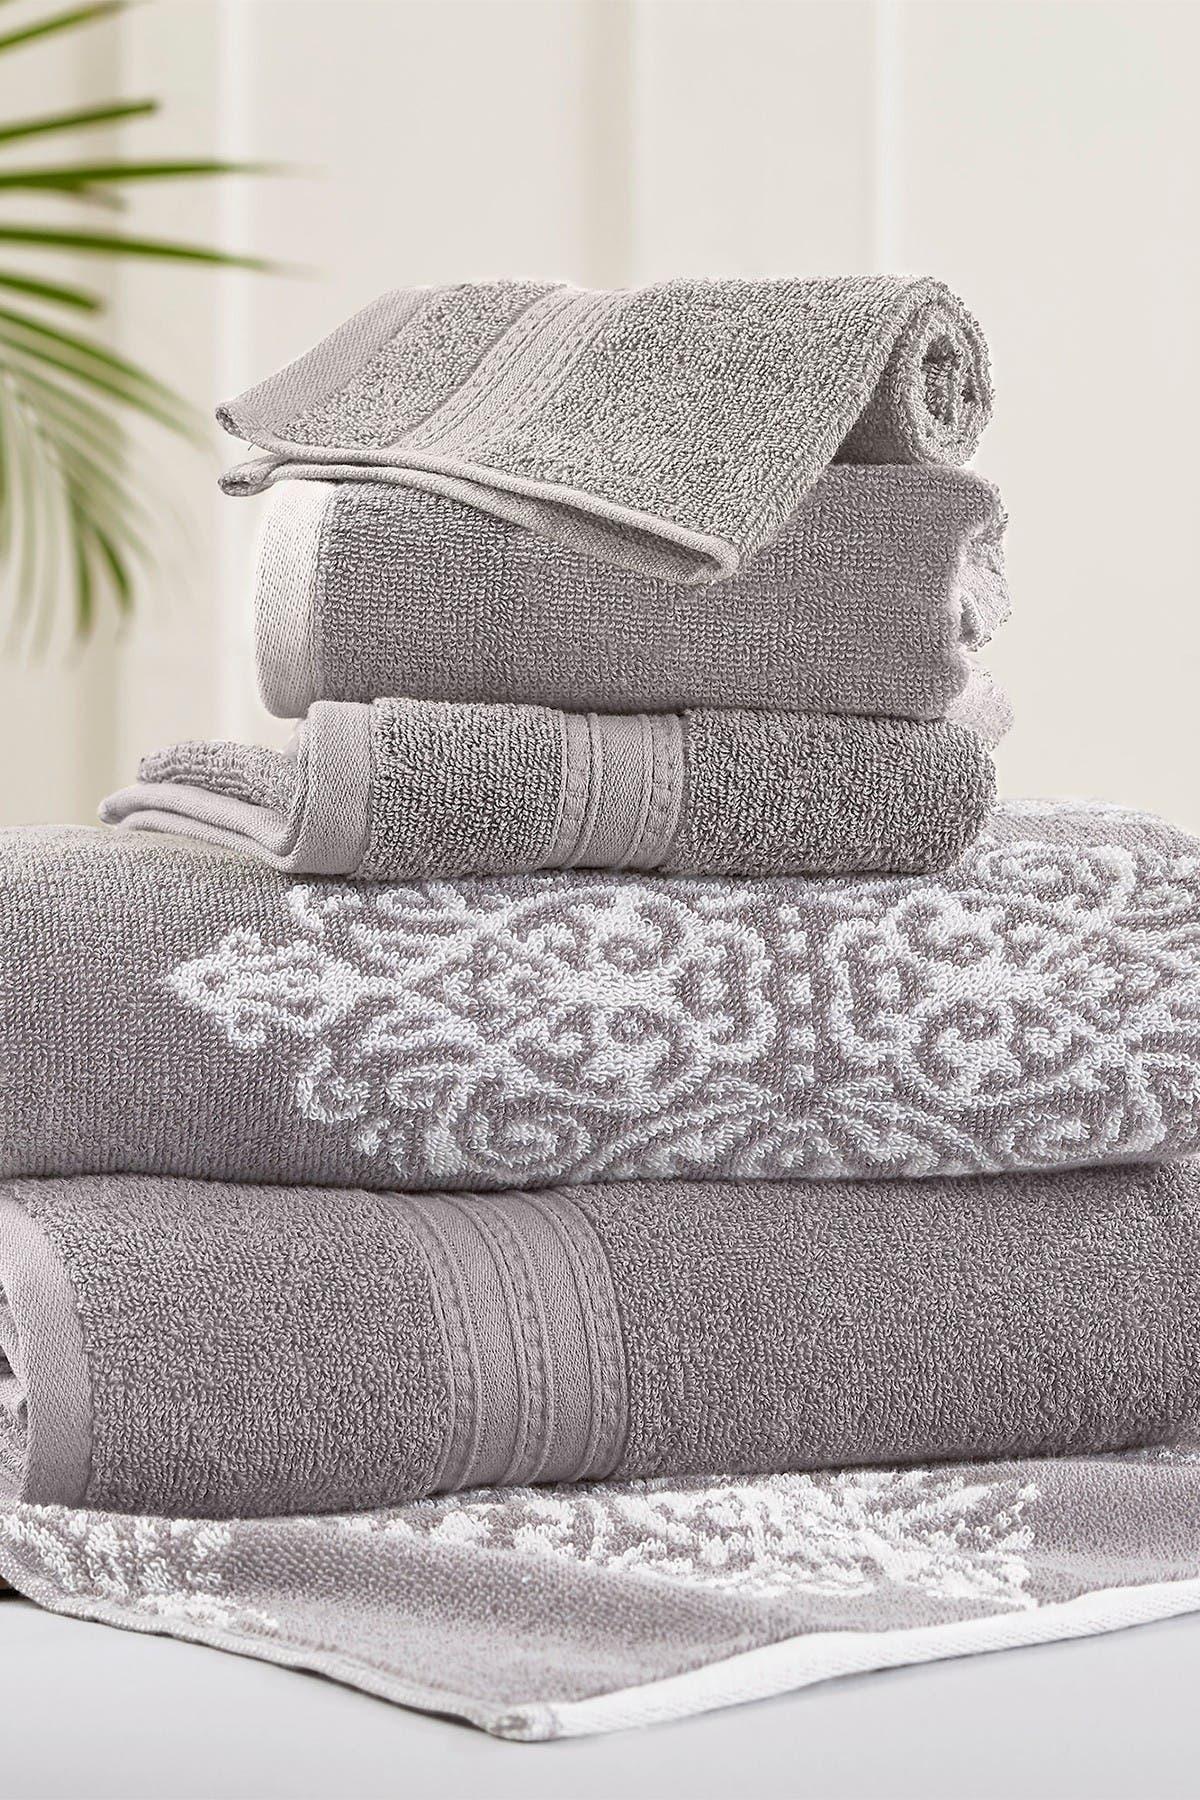 Image of Modern Threads Gray Artesia Damask Reversible Yarn-Dyed Jacquard 6-Piece Towel Set